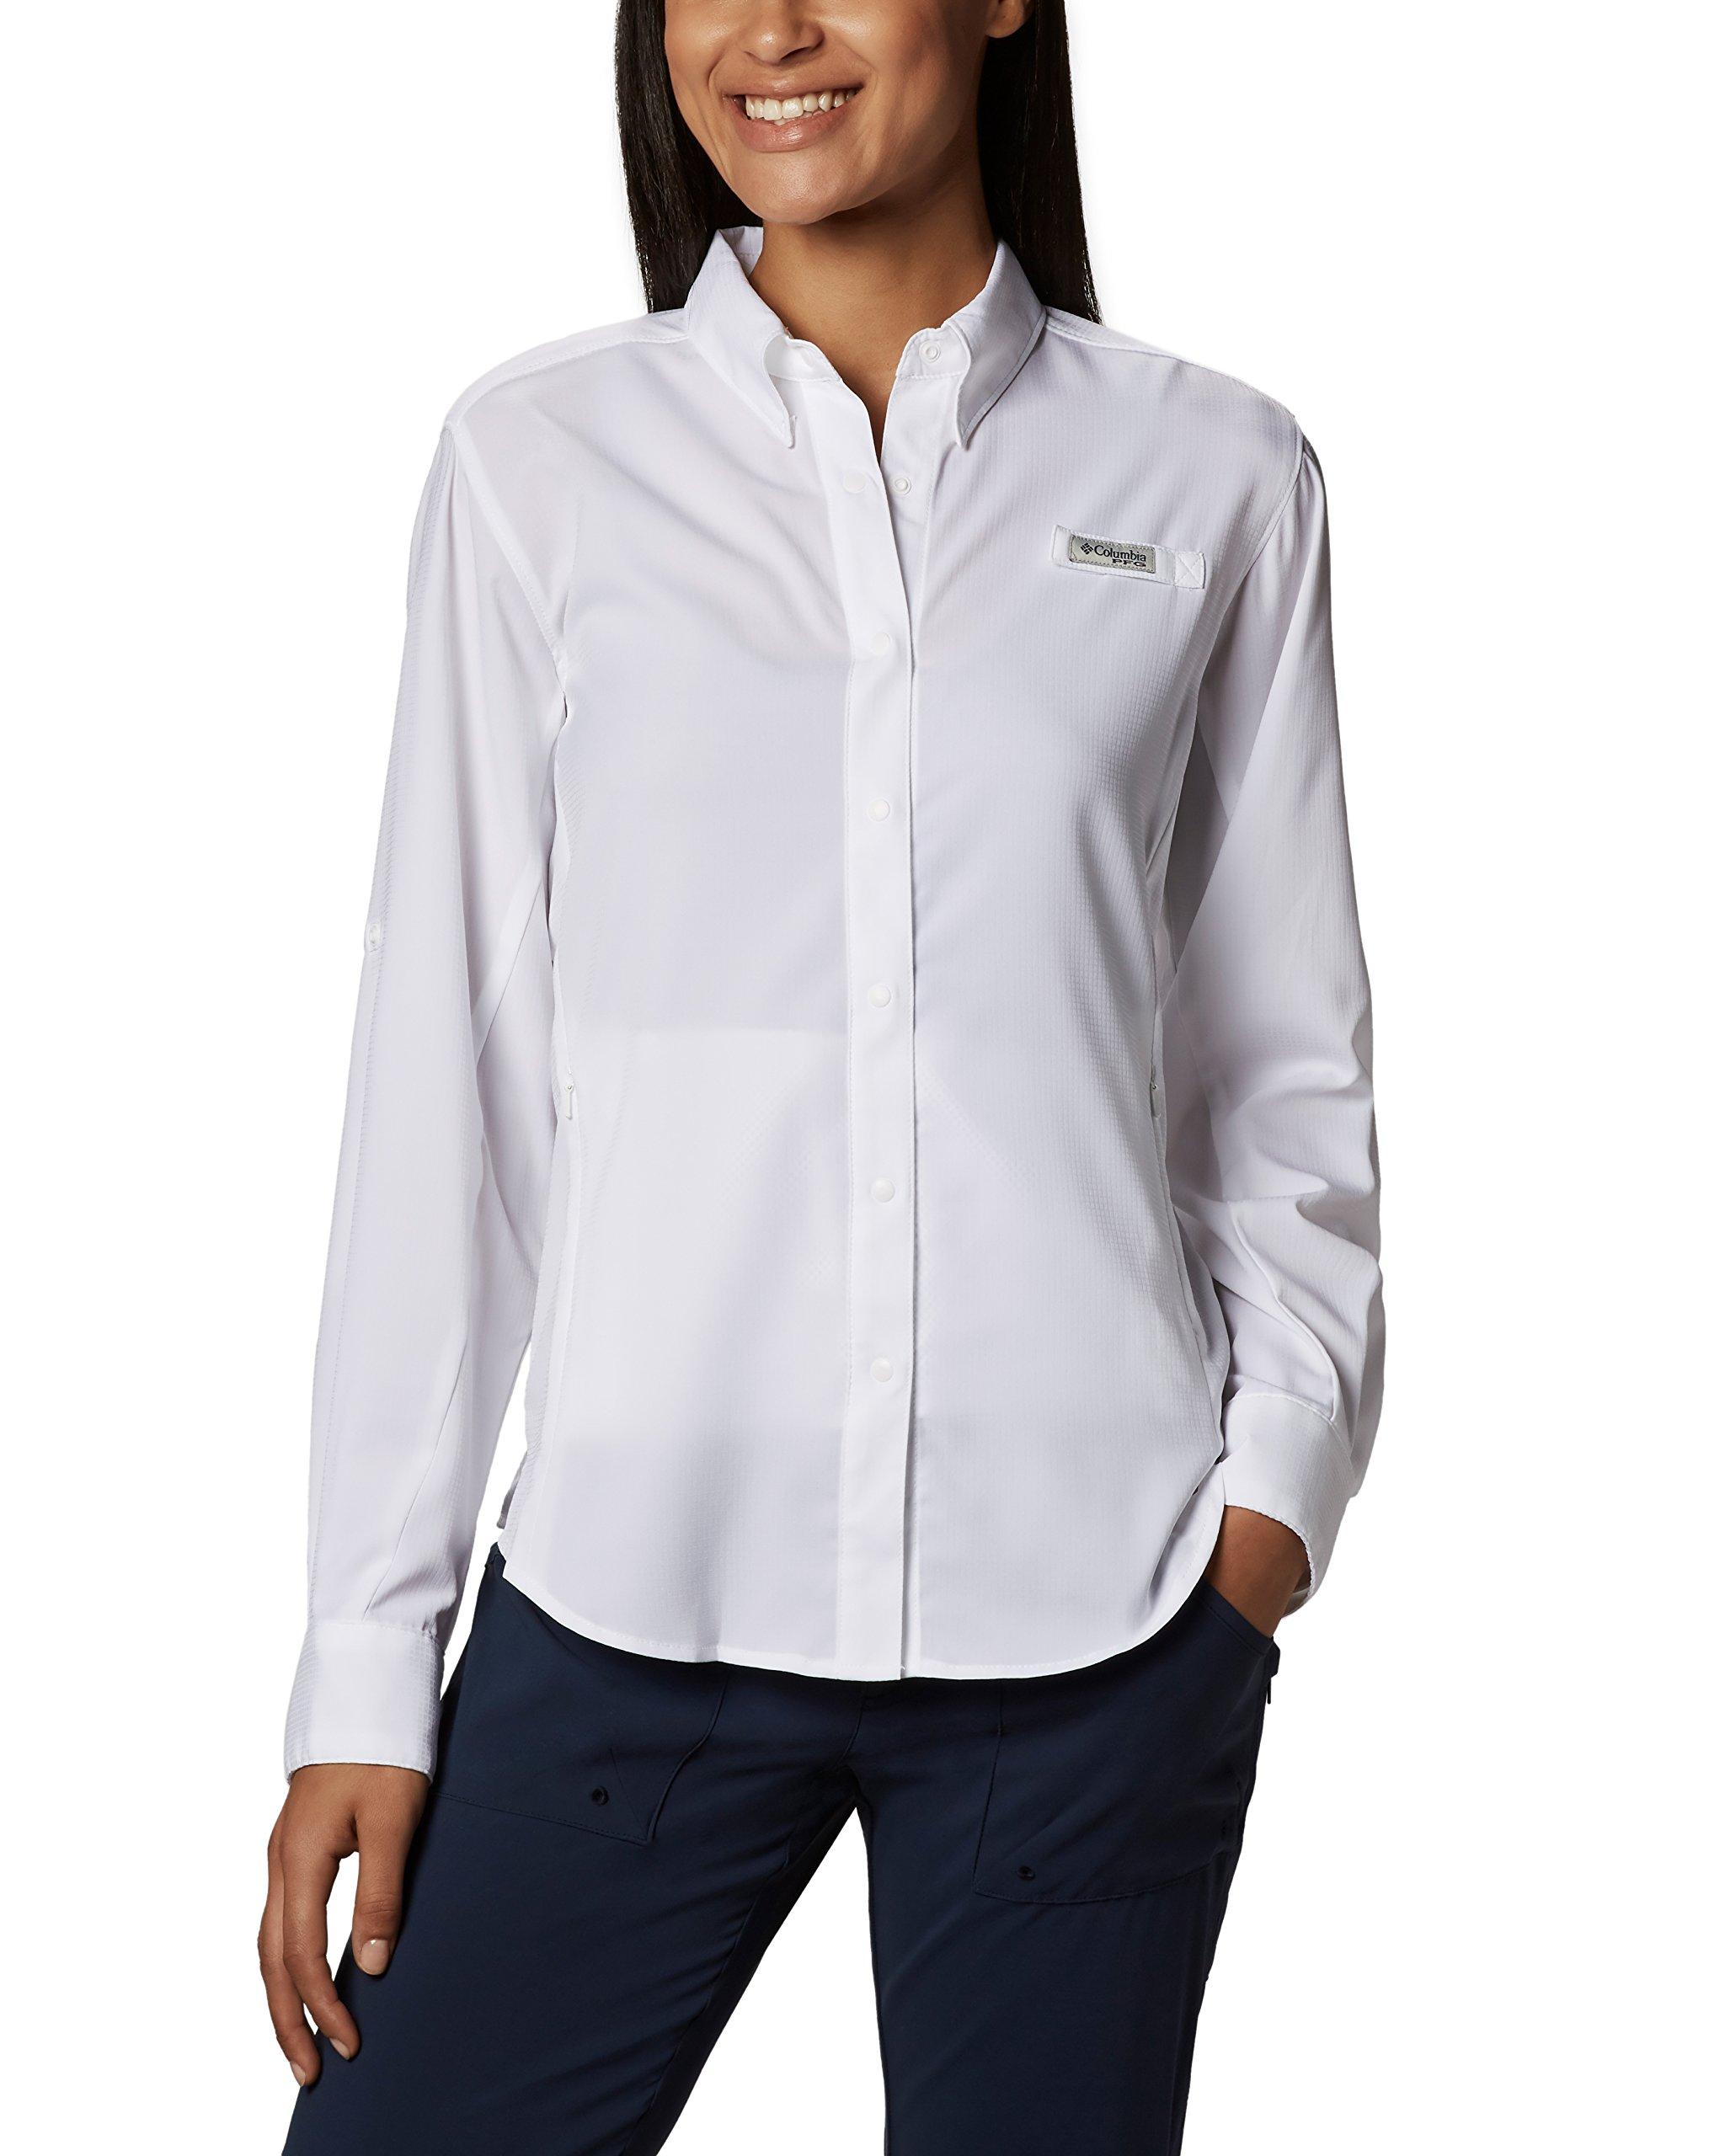 Columbia Women's Tamiami II Long Sleeve Shirt,White,3X